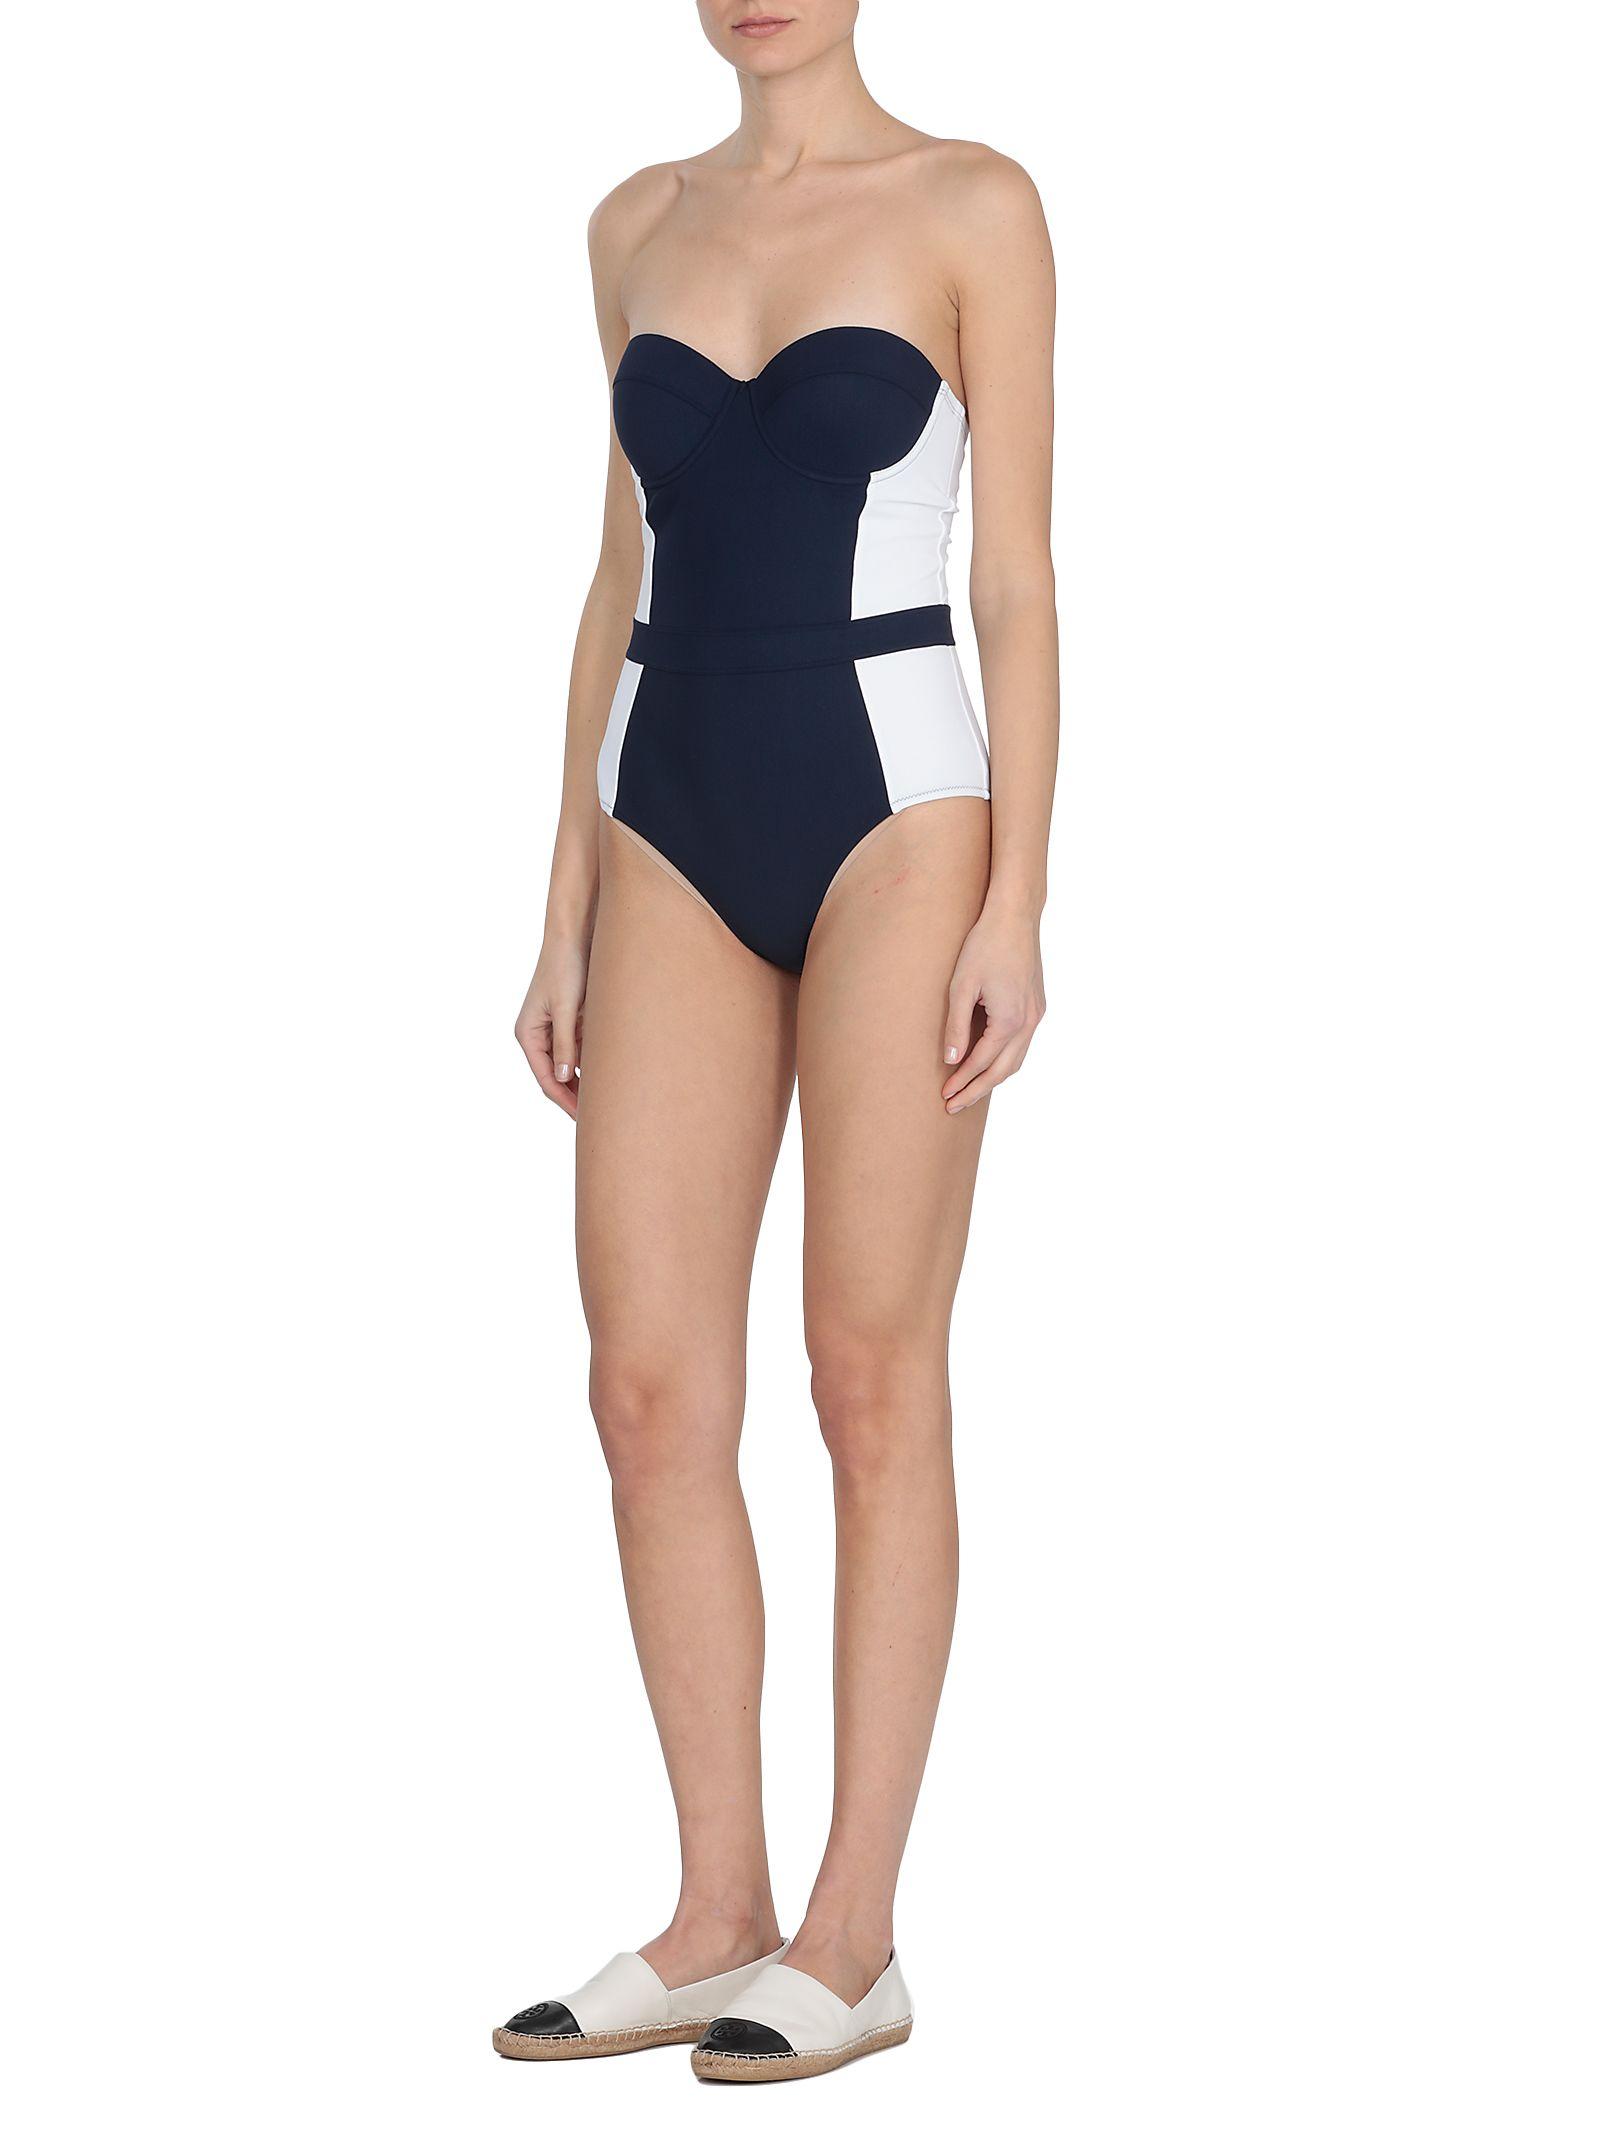 105f701d1df42 Tory Burch Tory Burch Lipsi One Piece Swimwear - TORY NAVY   WHITE ...